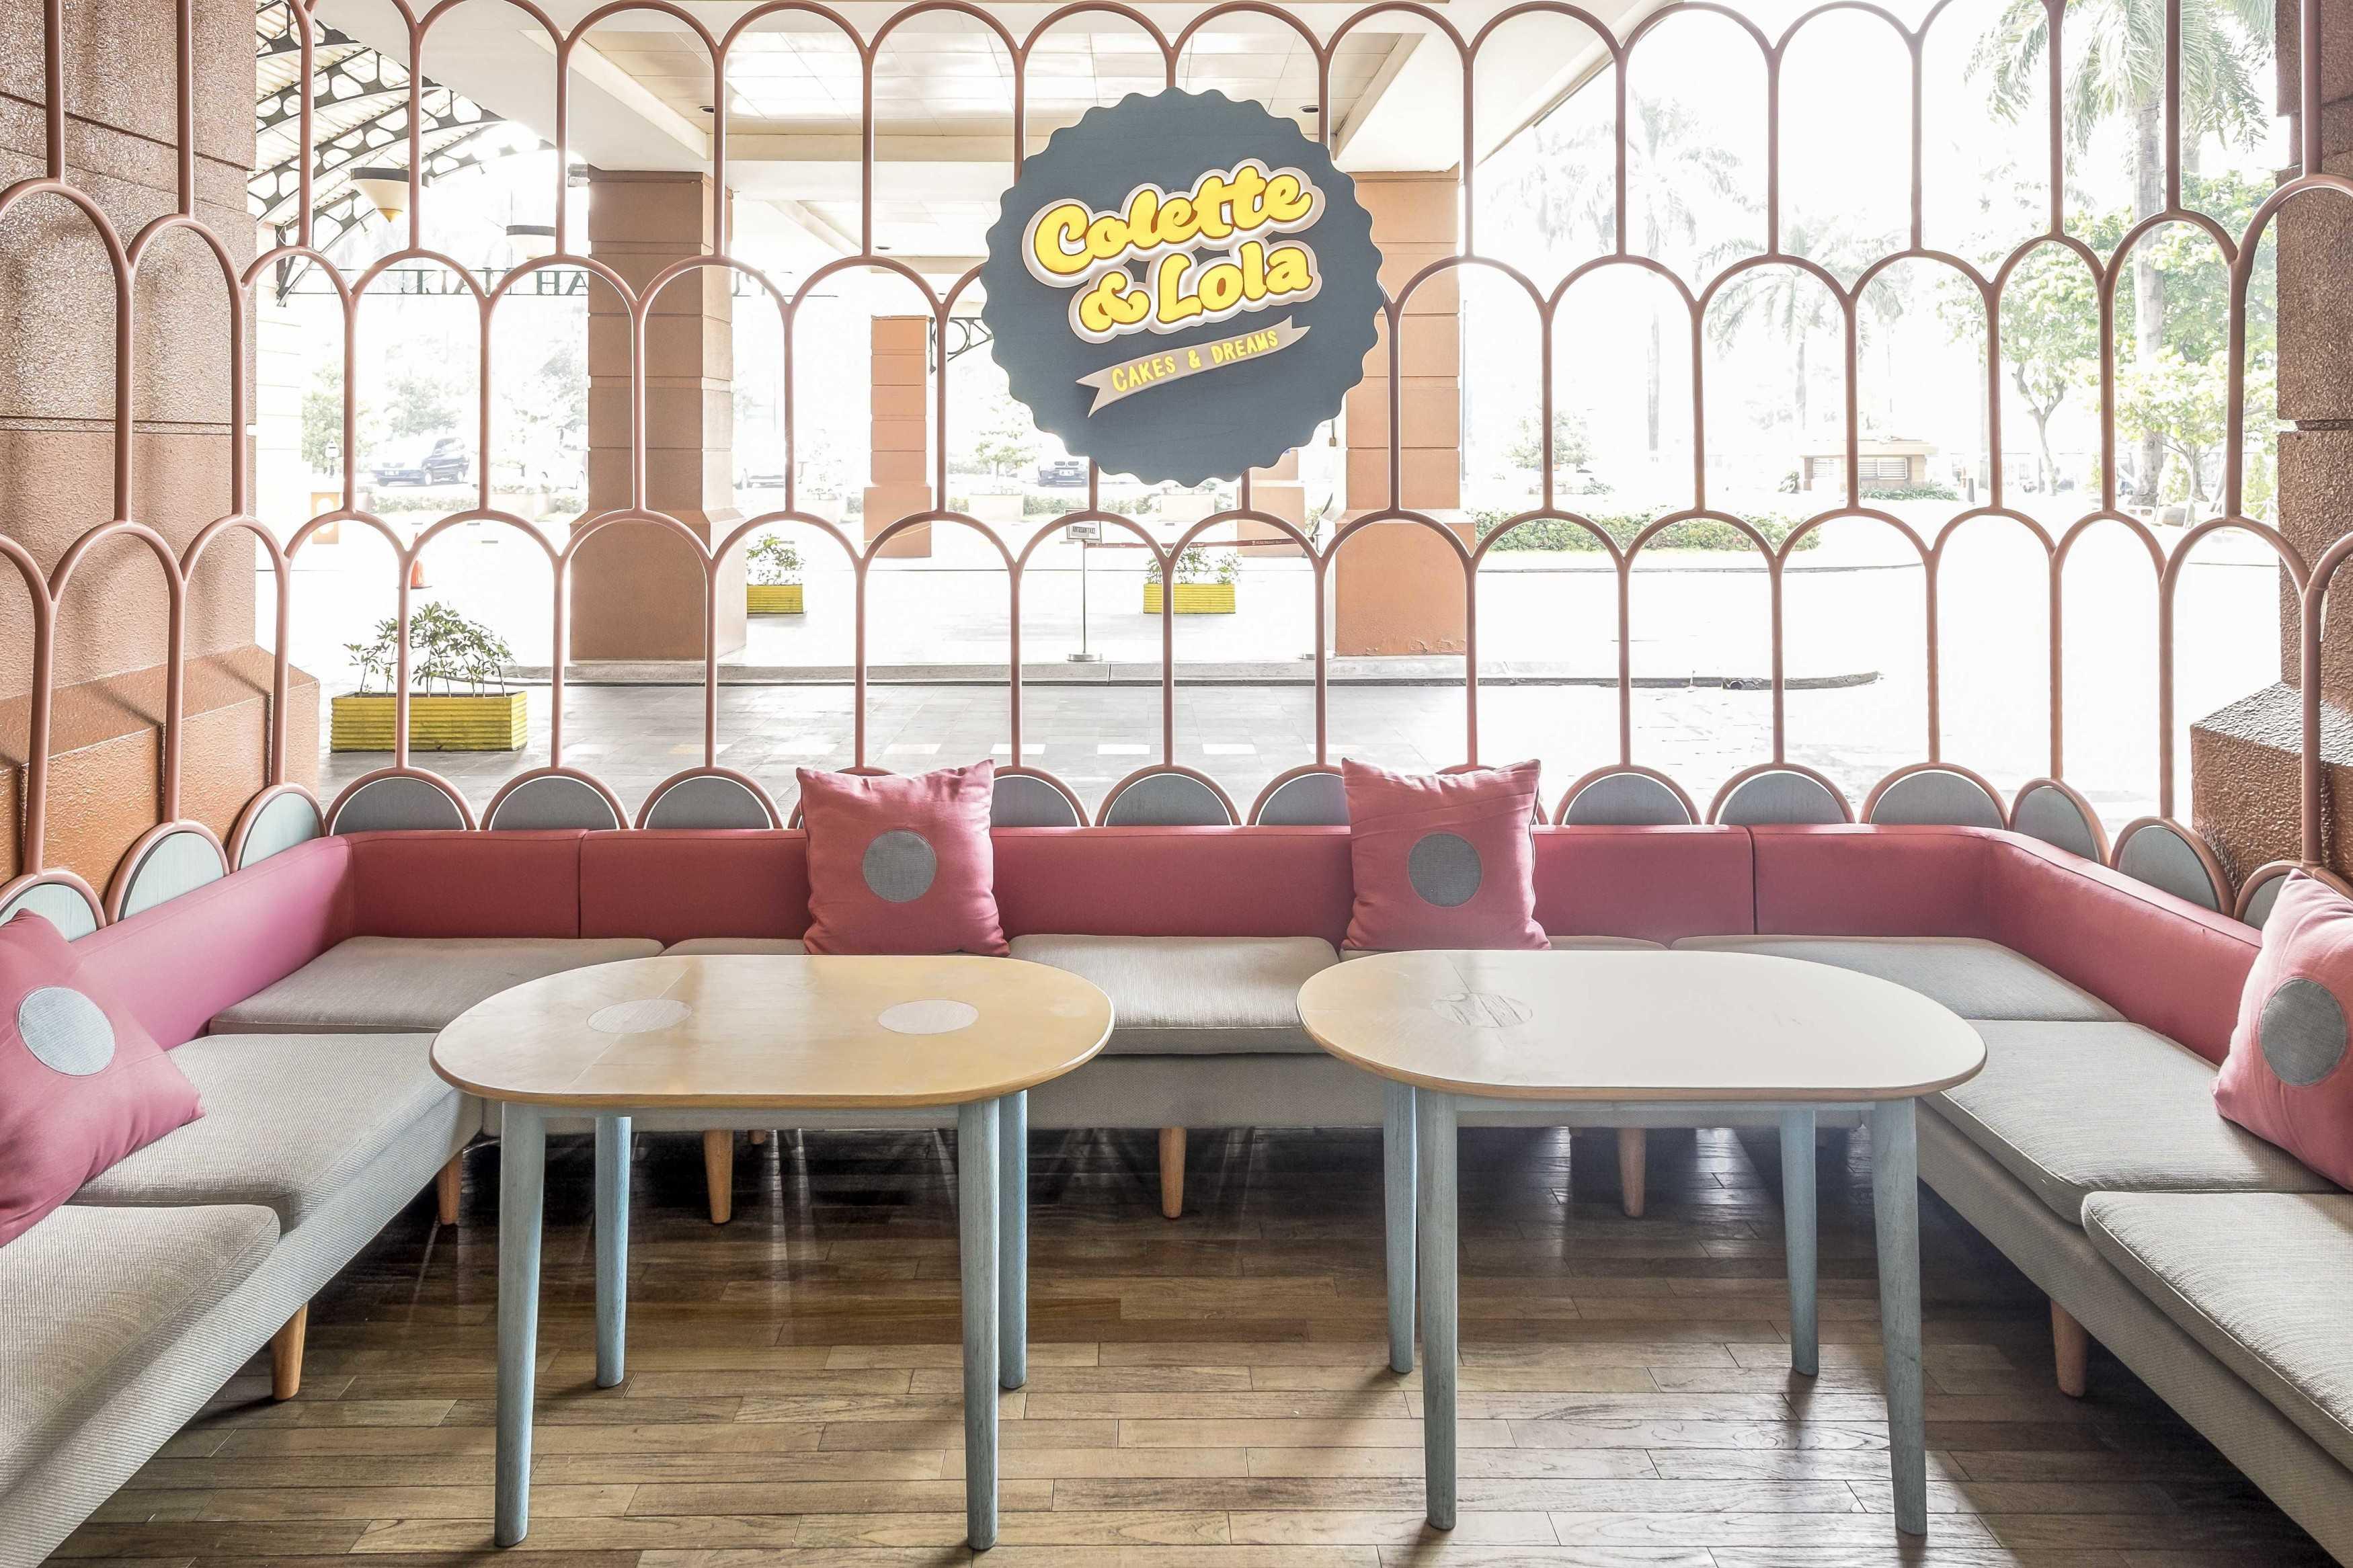 Alvin Tjitrowirjo, Alvint Studio Colette Lola Puri Indah  Puri Indah Mall, Jakarta  Puri Indah Mall, Jakarta  Seating Area Restaurant Modern  15627